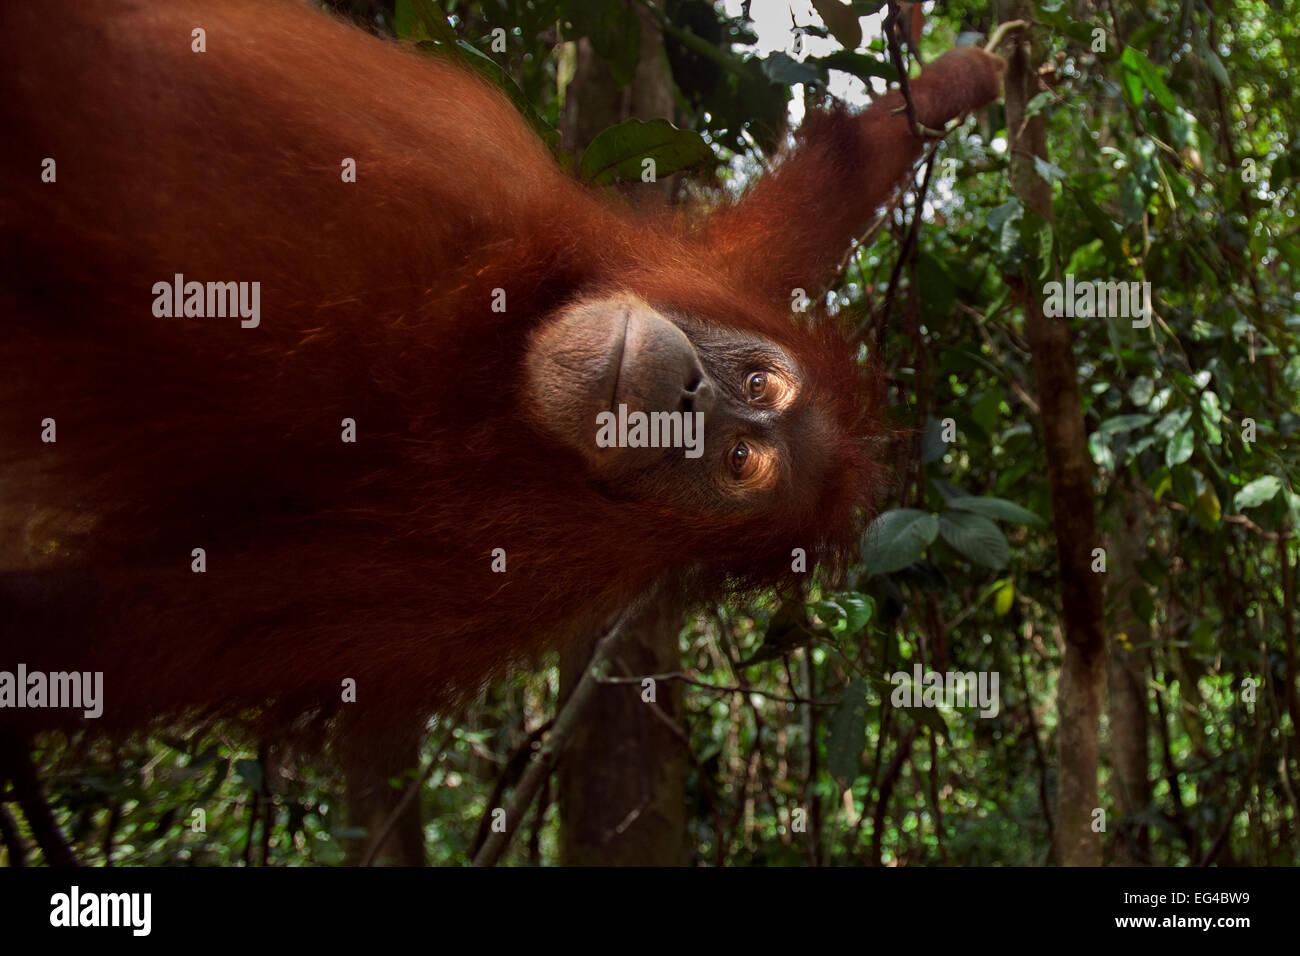 Sumatran orangutan (Pongo abelii) female 'Juni' aged 12 years swinging liana. Gunung Leuser National Park - Stock Image